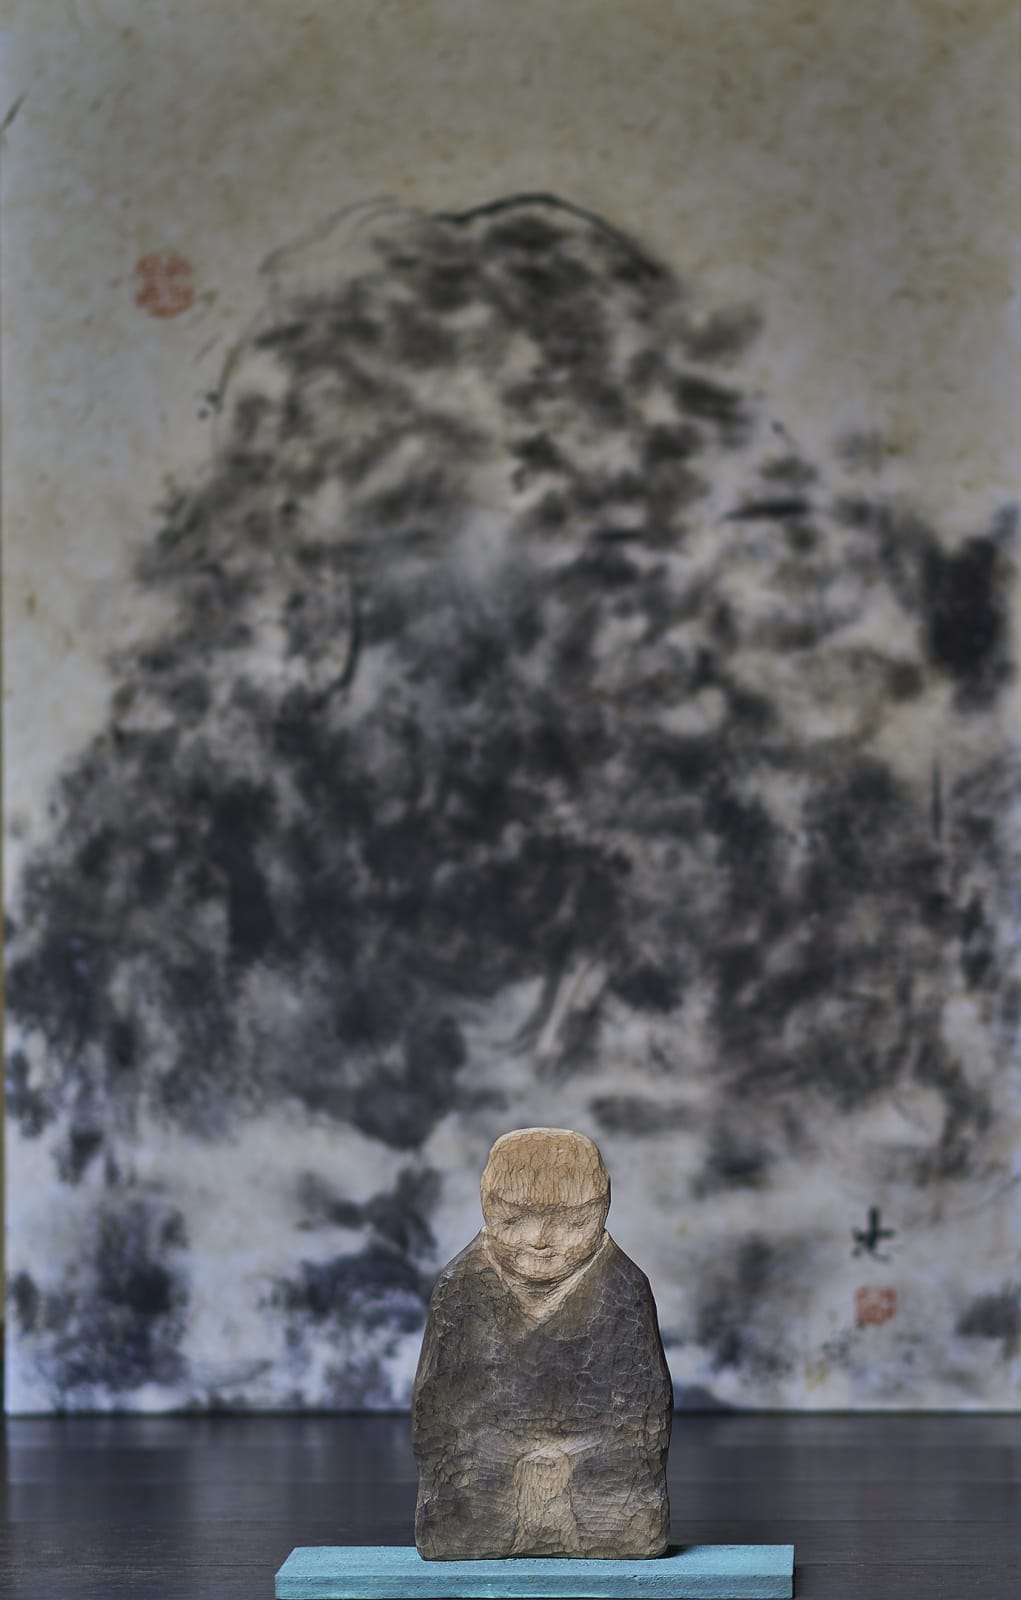 Sho Kishino, Seated, 2020